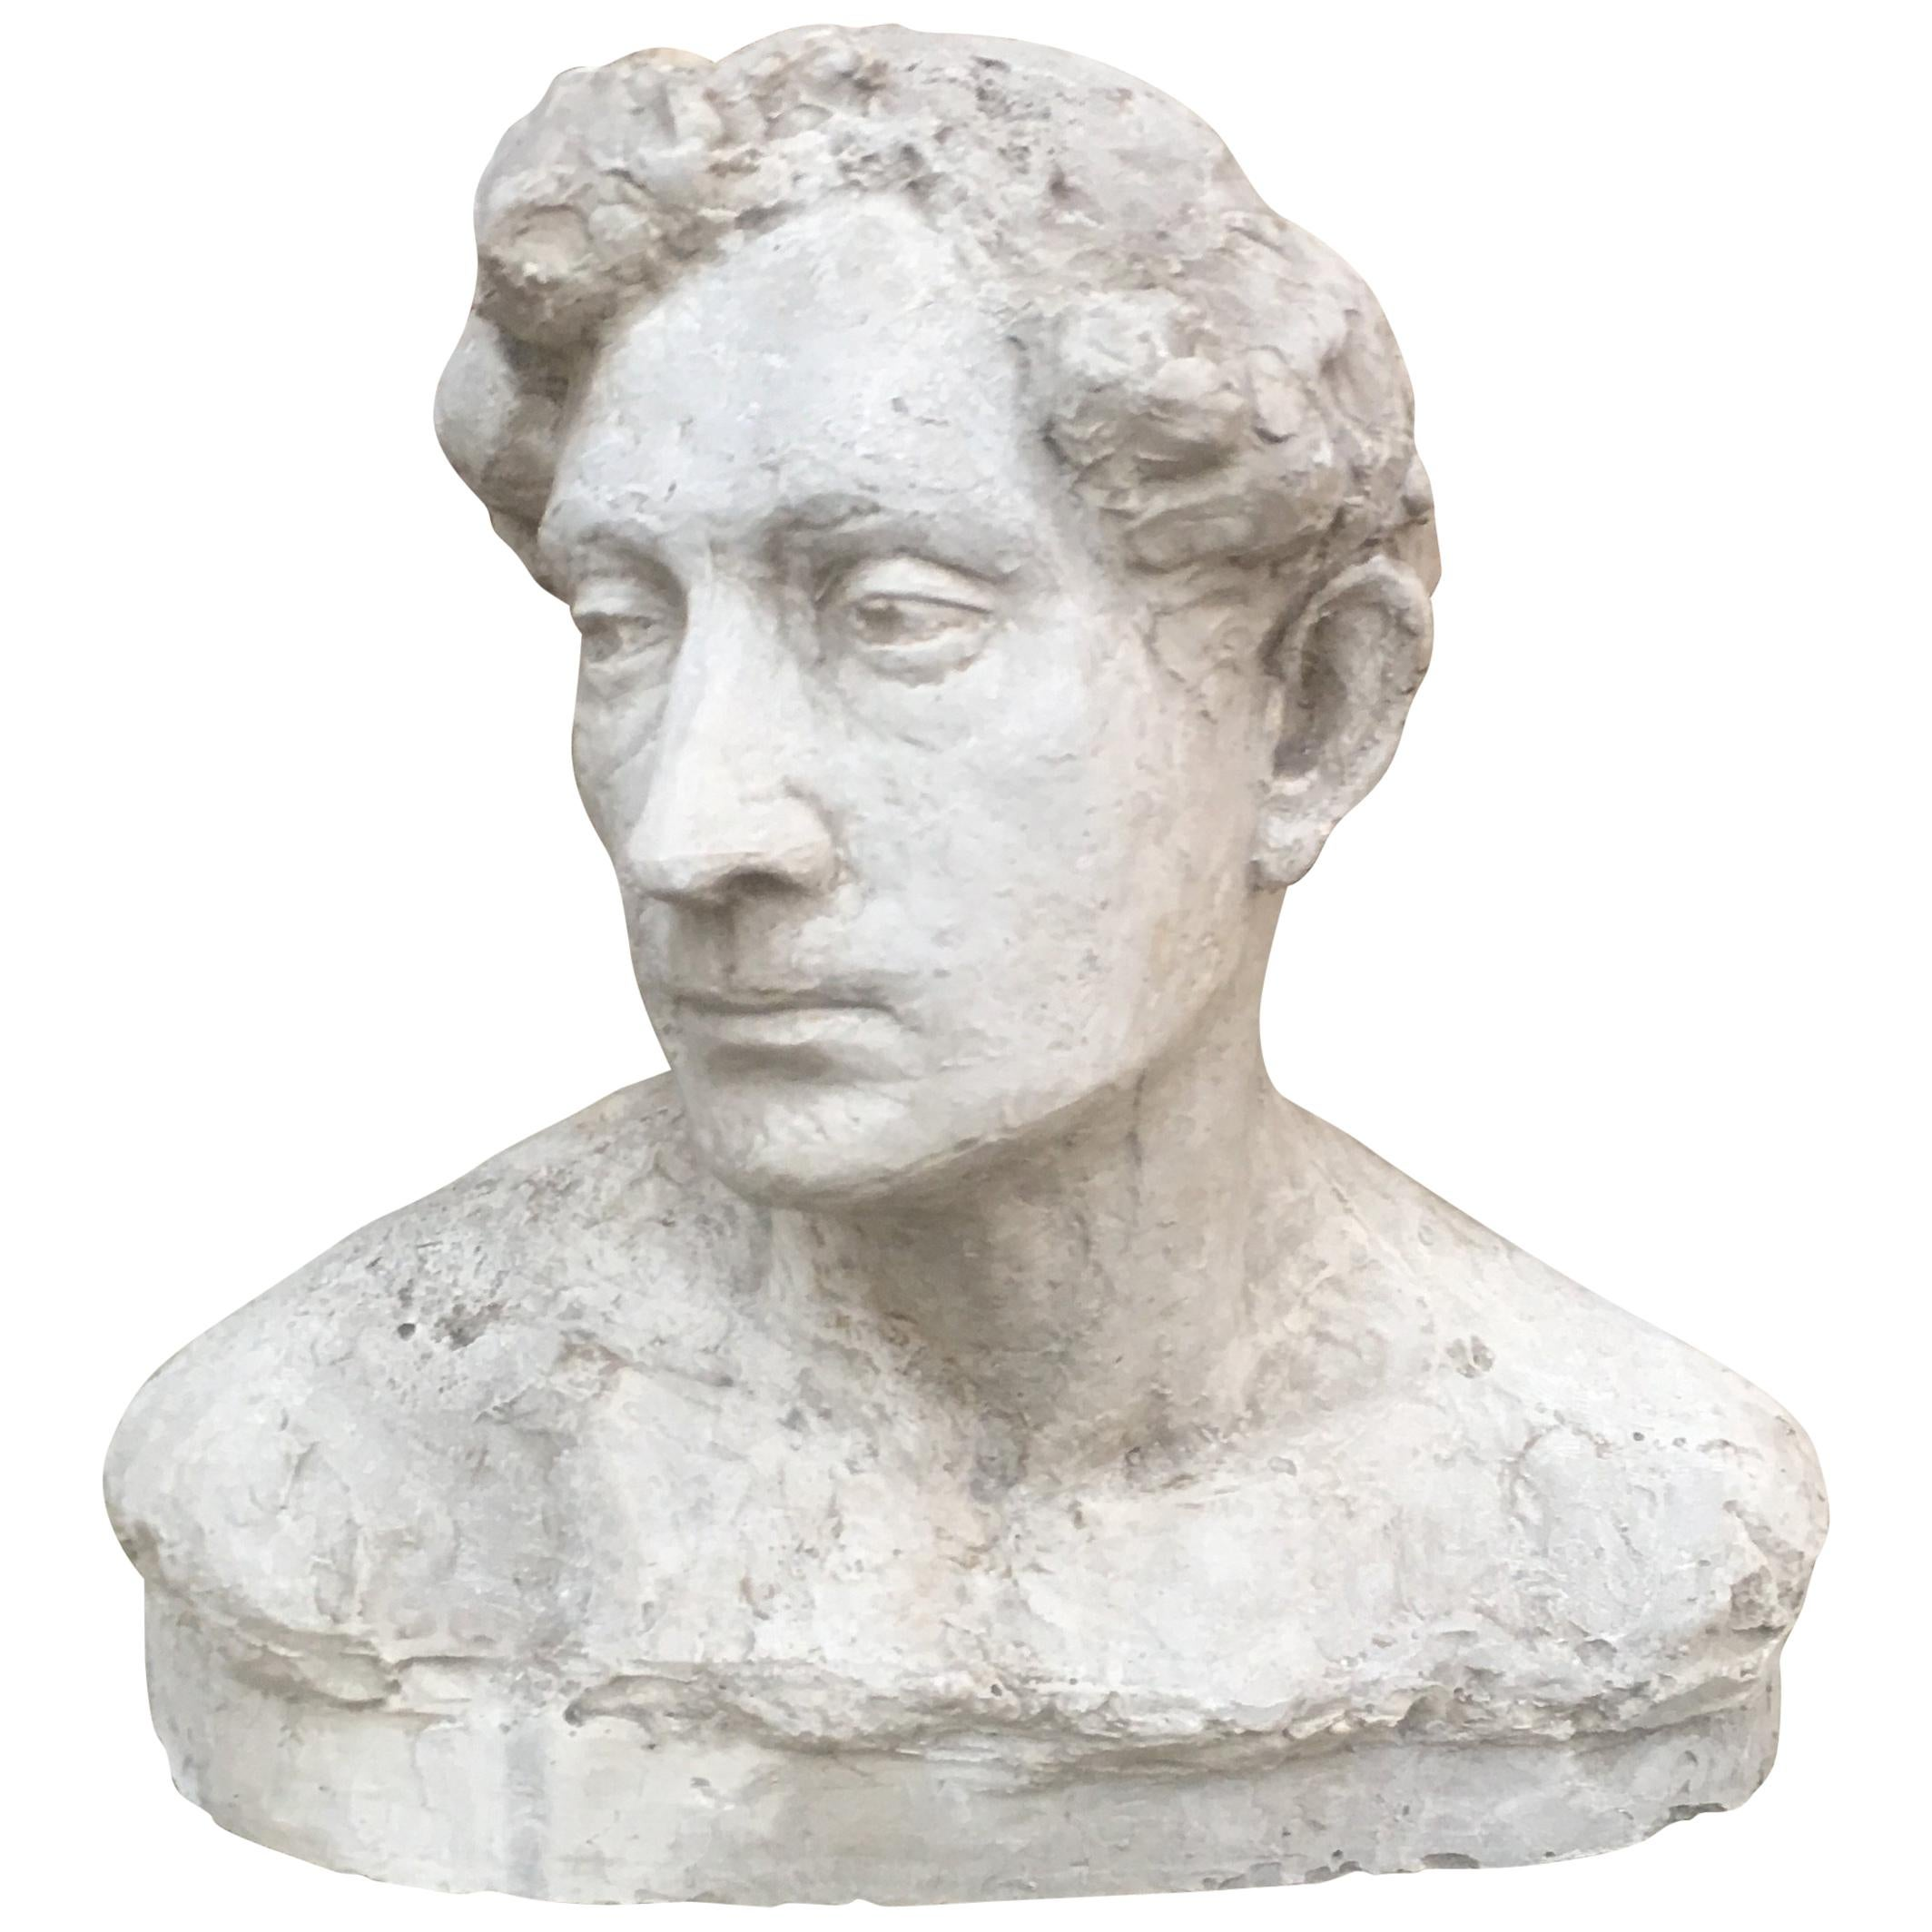 "Ernestine Sirine-Real ""Romantique Art Deco"" Bust of a Man"", Plaster"